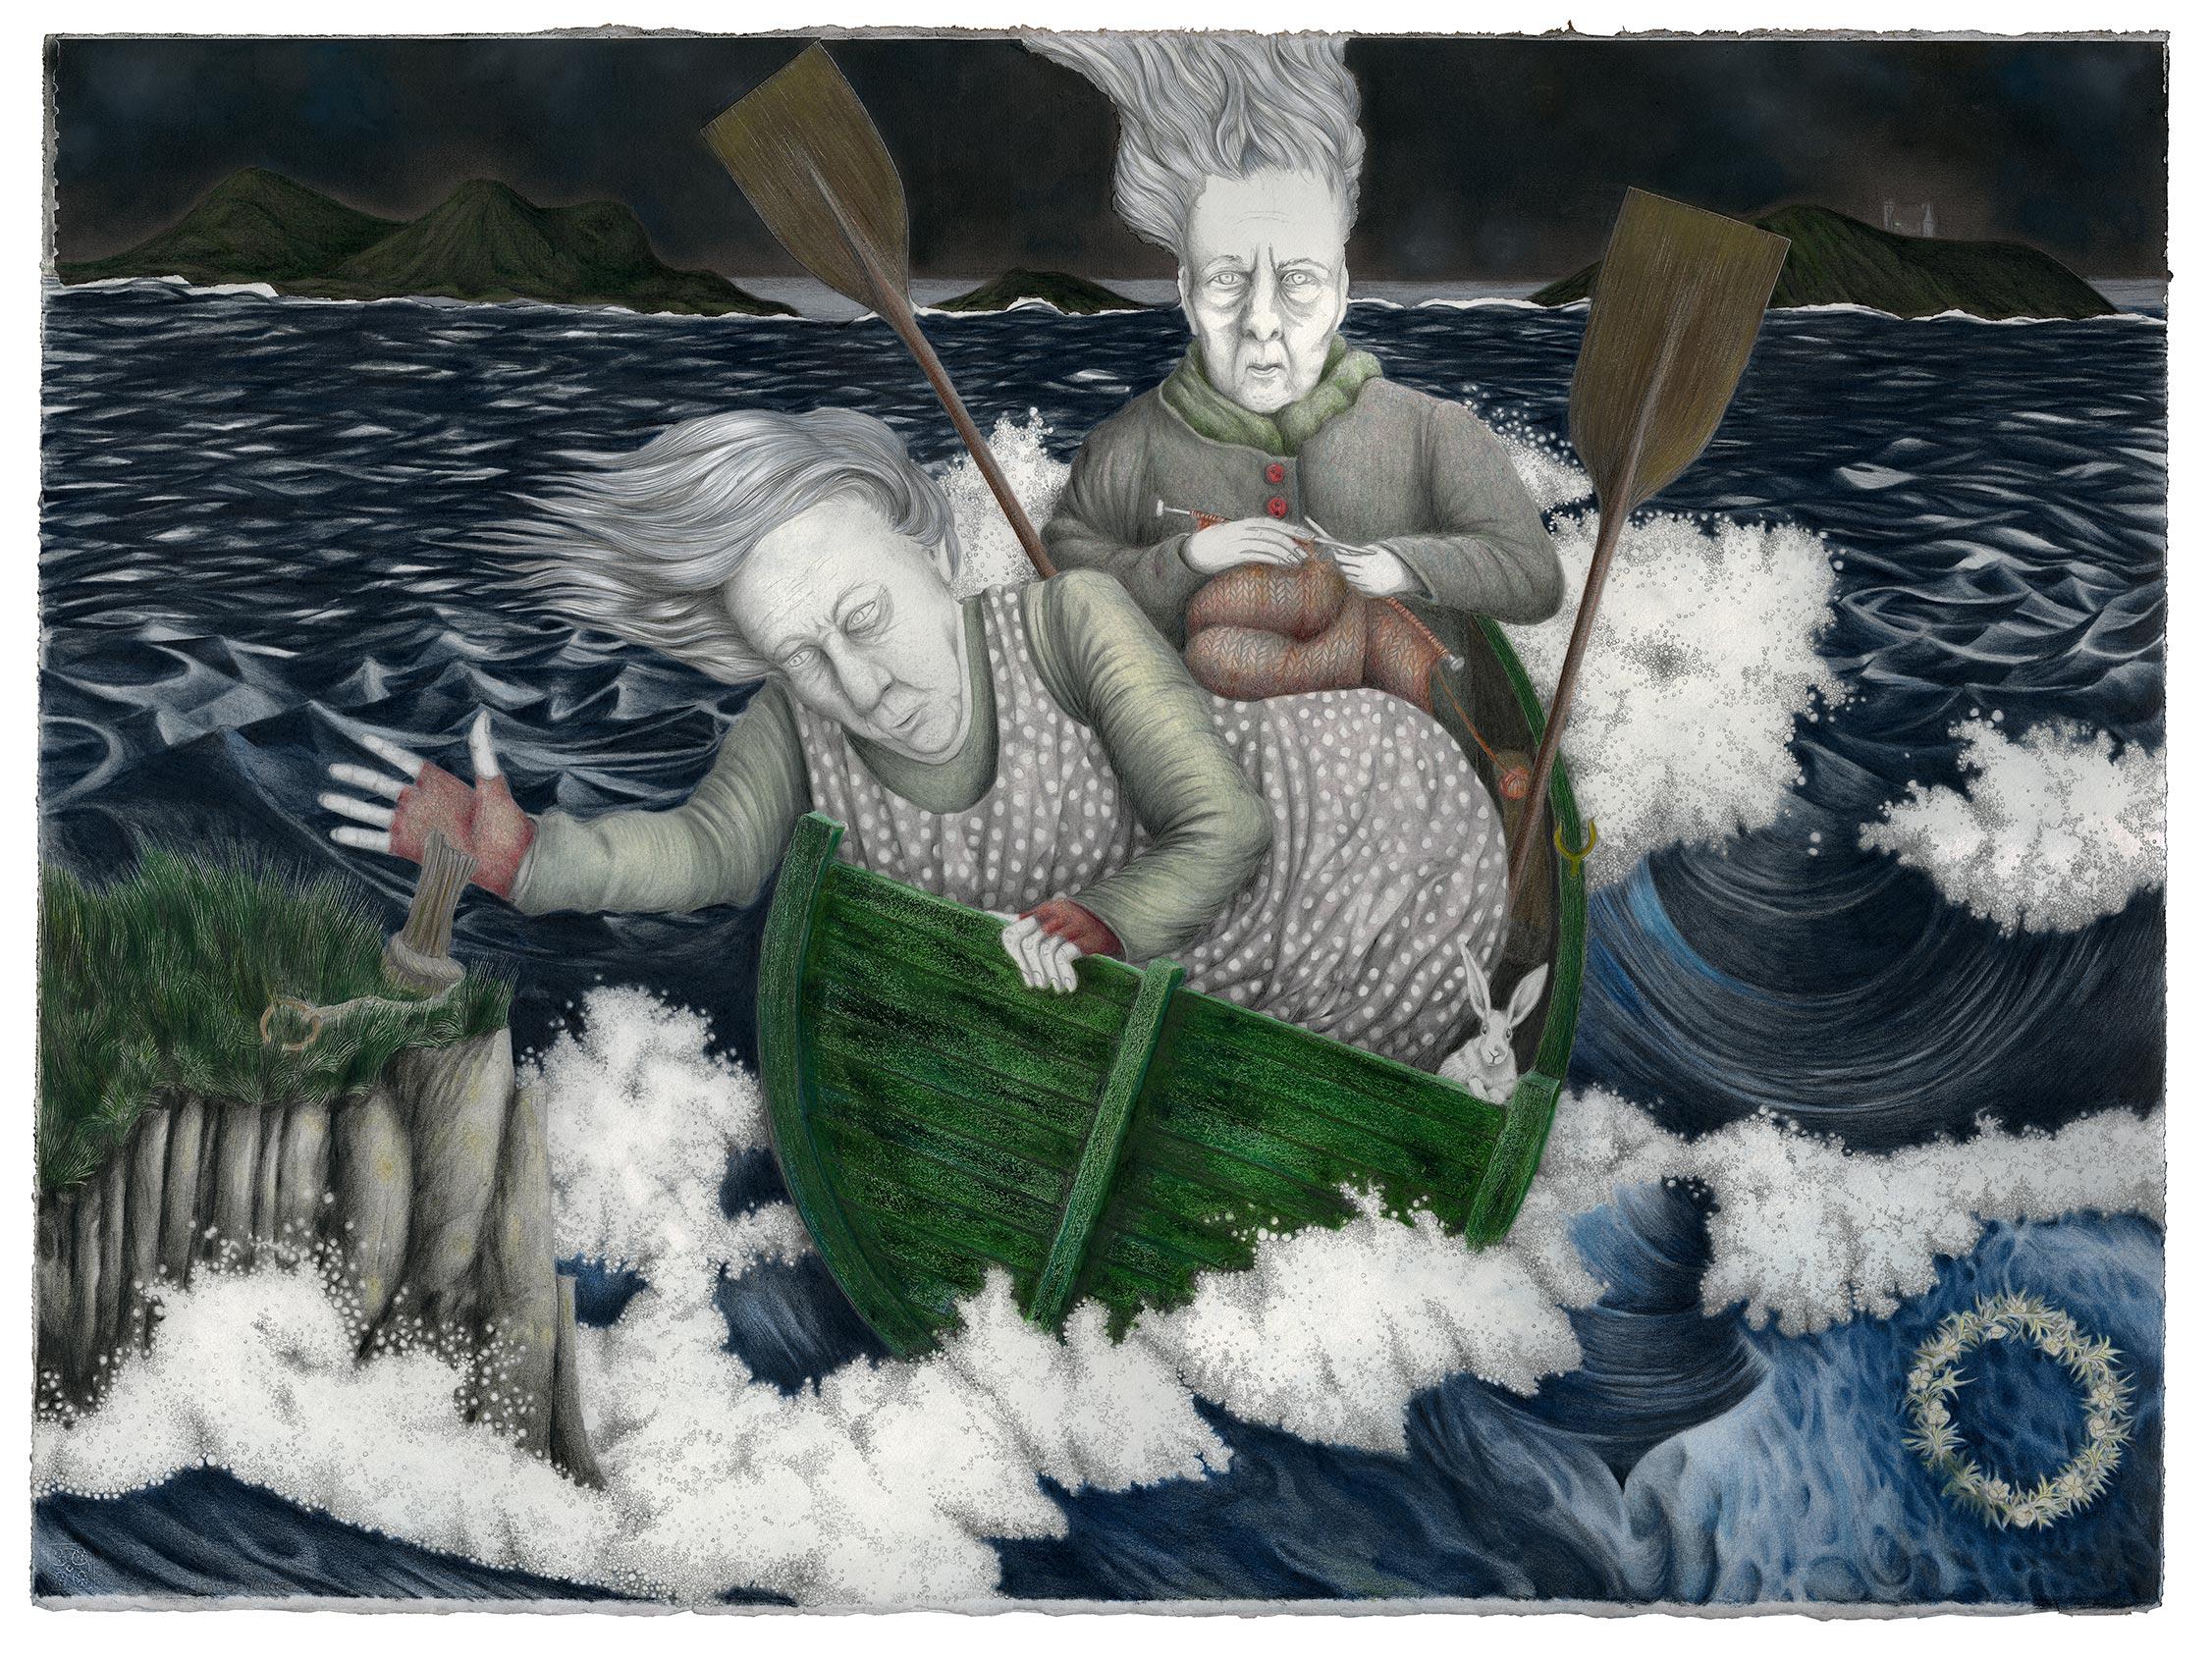 Louise Vercoe, Casting Off, Coloured Pencil on paper, height 58 cm width 77 cm,  http://www.facebook.com/LouiseVercoe.art